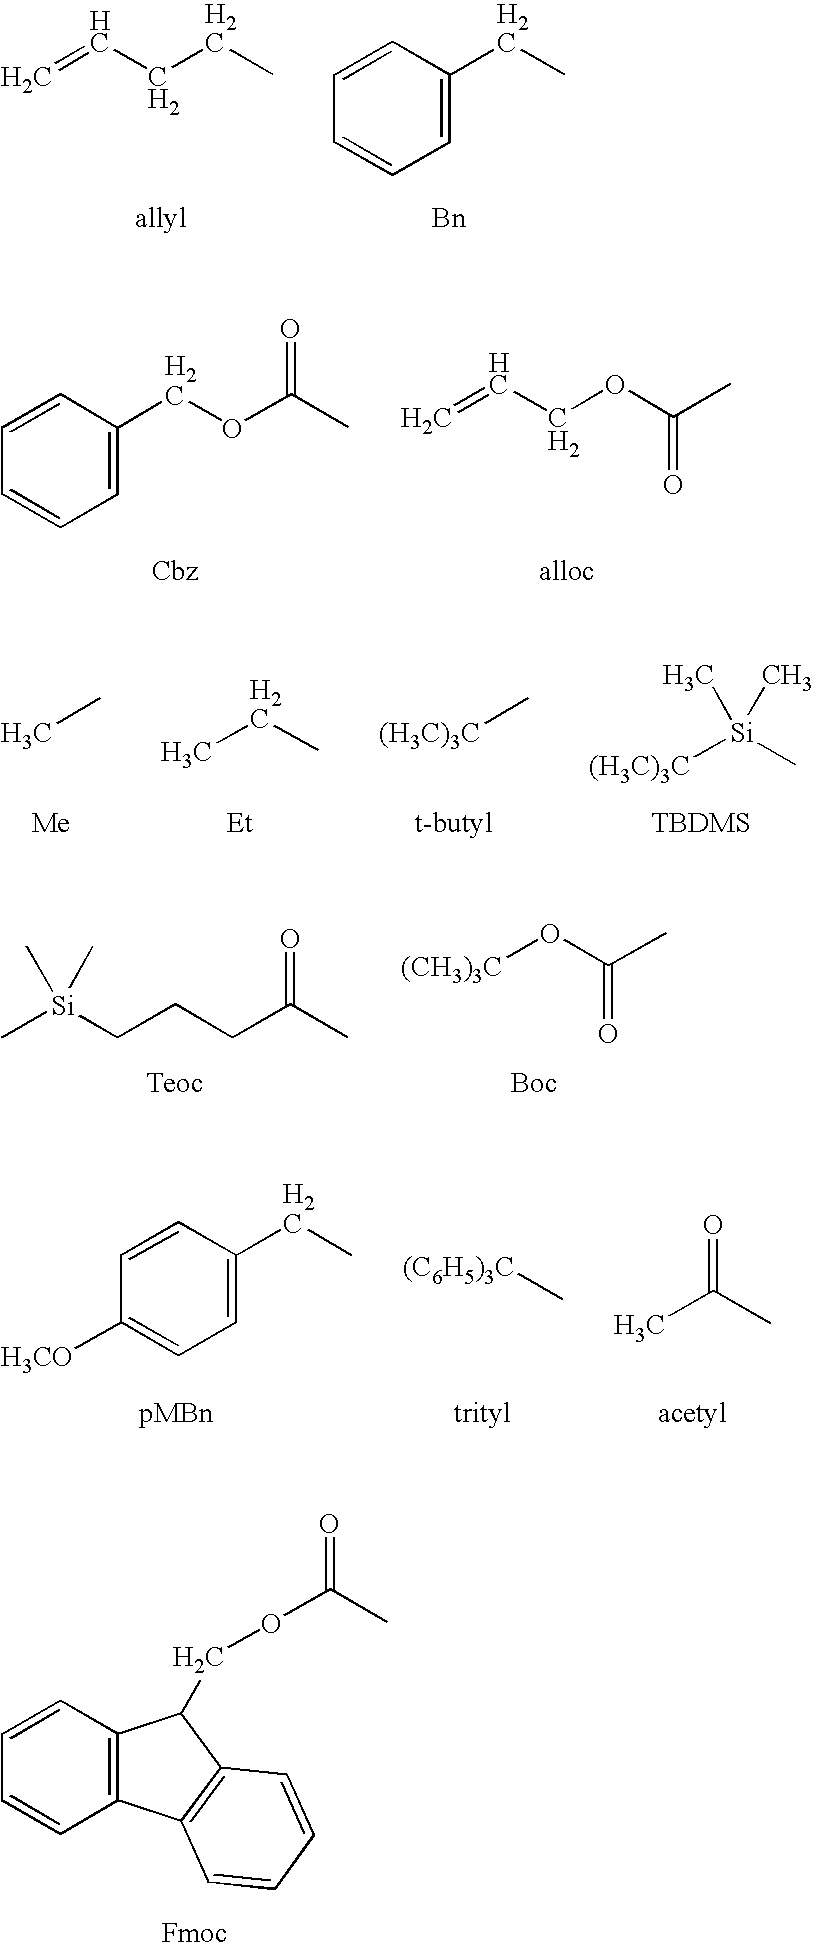 Us20100135959a1 Human Interferon Molecules And Their Uses Google Midland 1165 Diagram 18 19 805 Figure 20100603 C00004